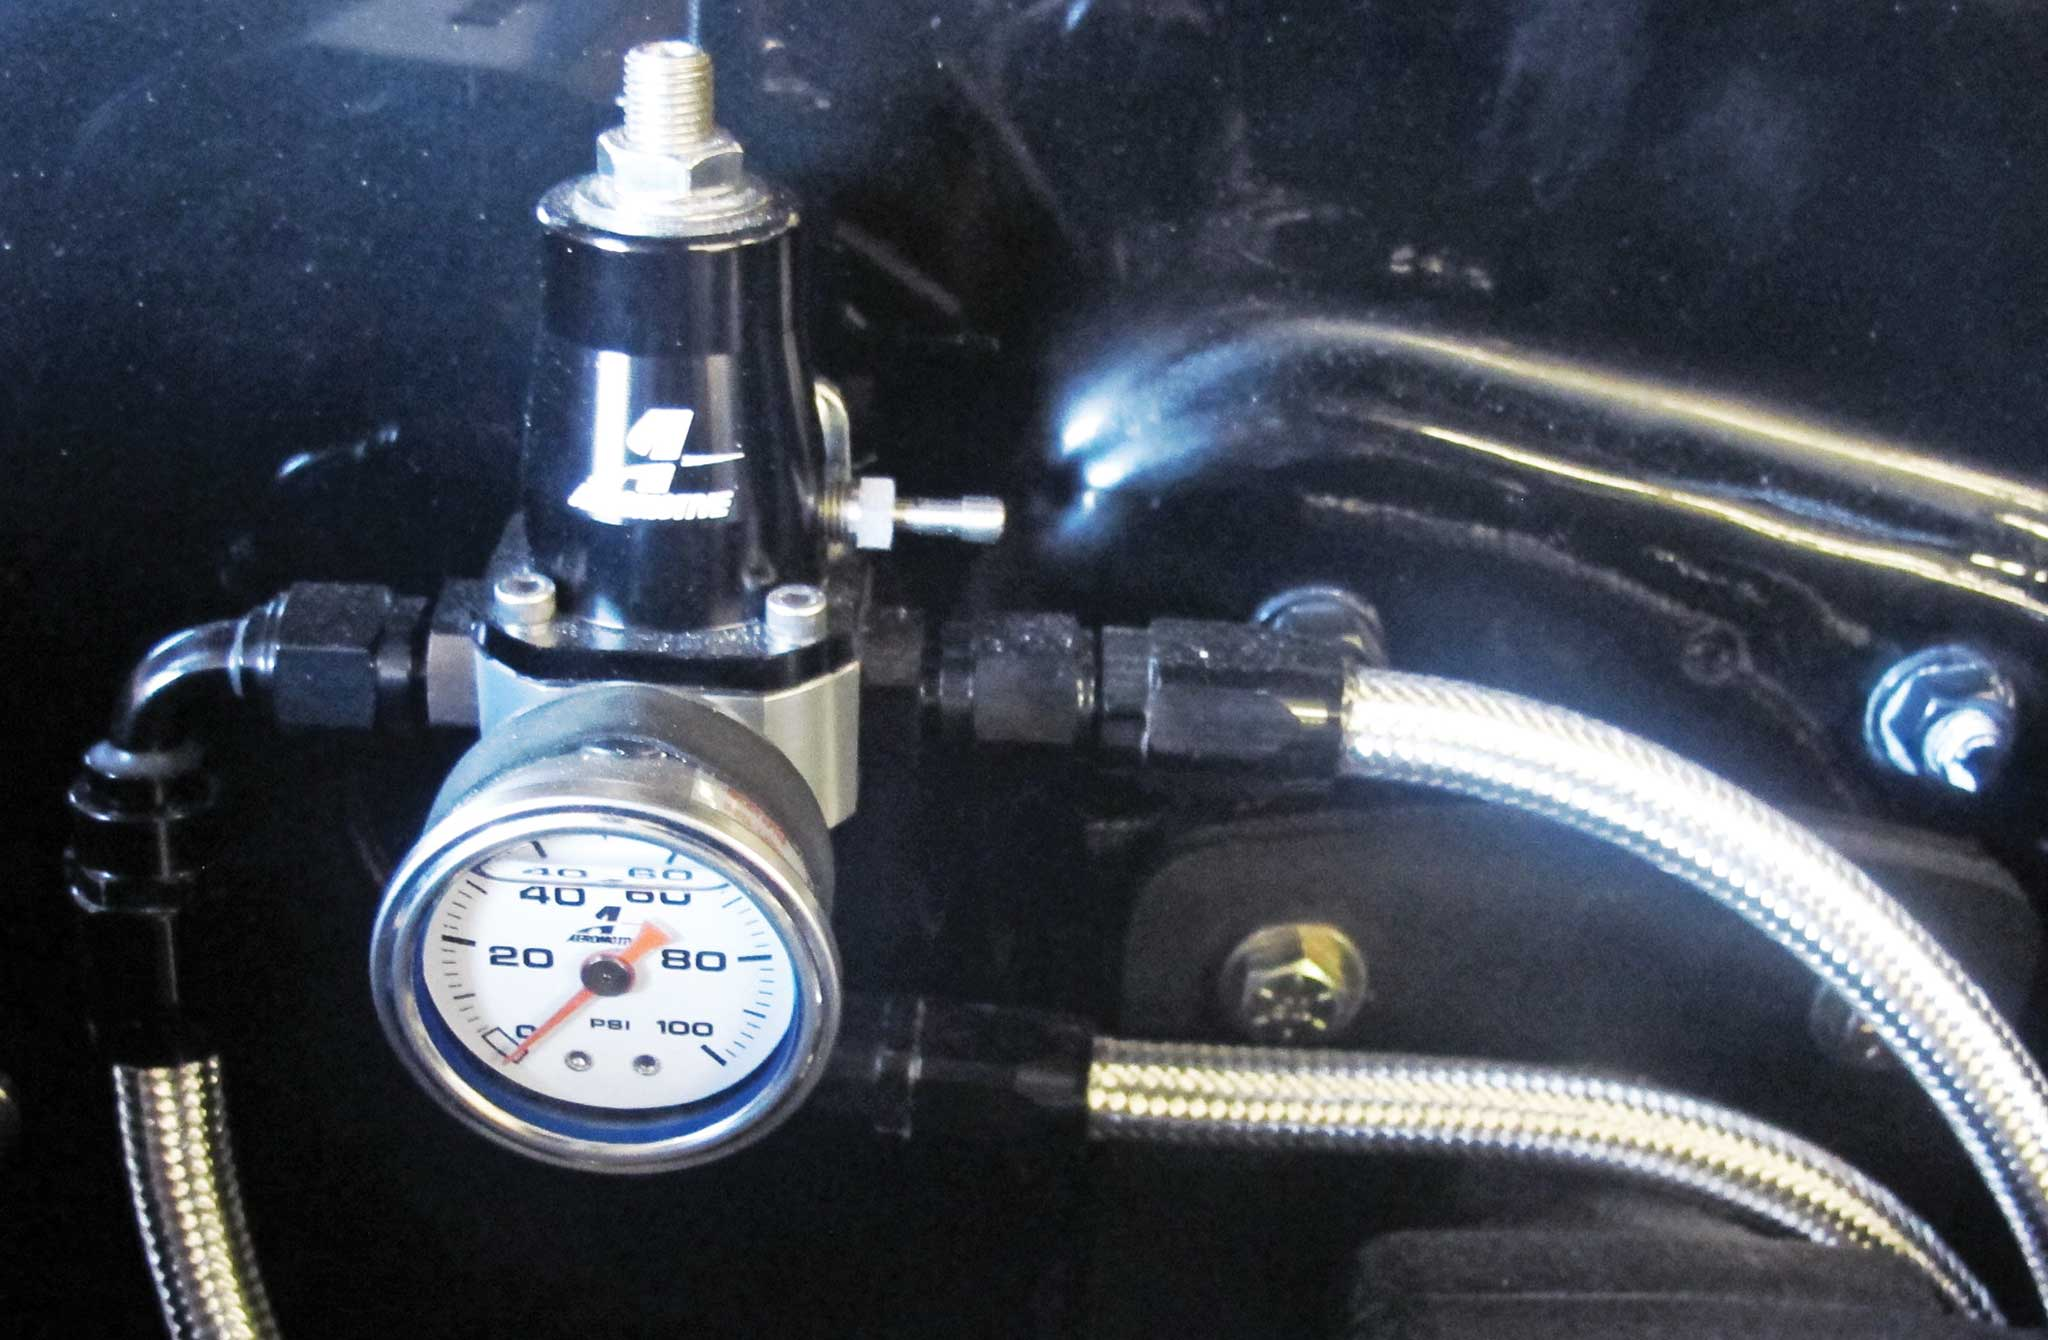 aeromotive phantom fuel pump system install aeromotive fuel pressure regulator aeromotive phantom fuel pump system install aeromotive fuel pressure